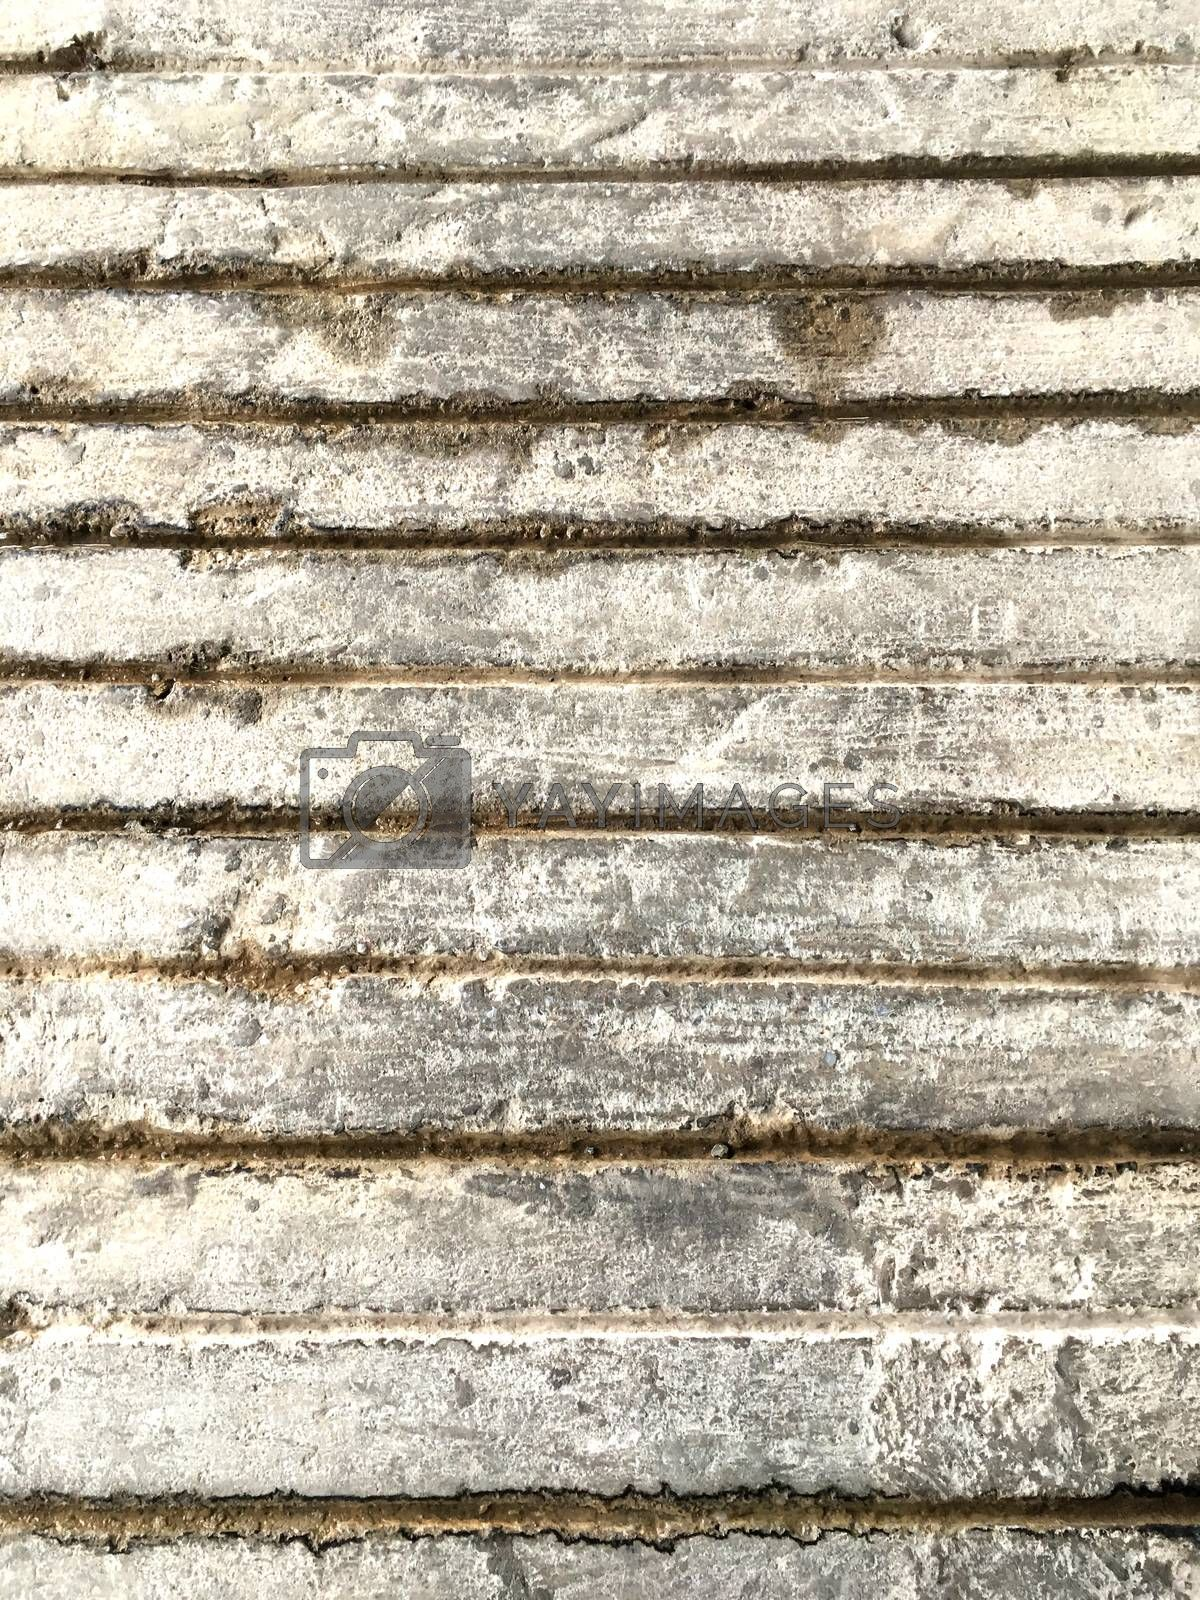 wet concrete floor background